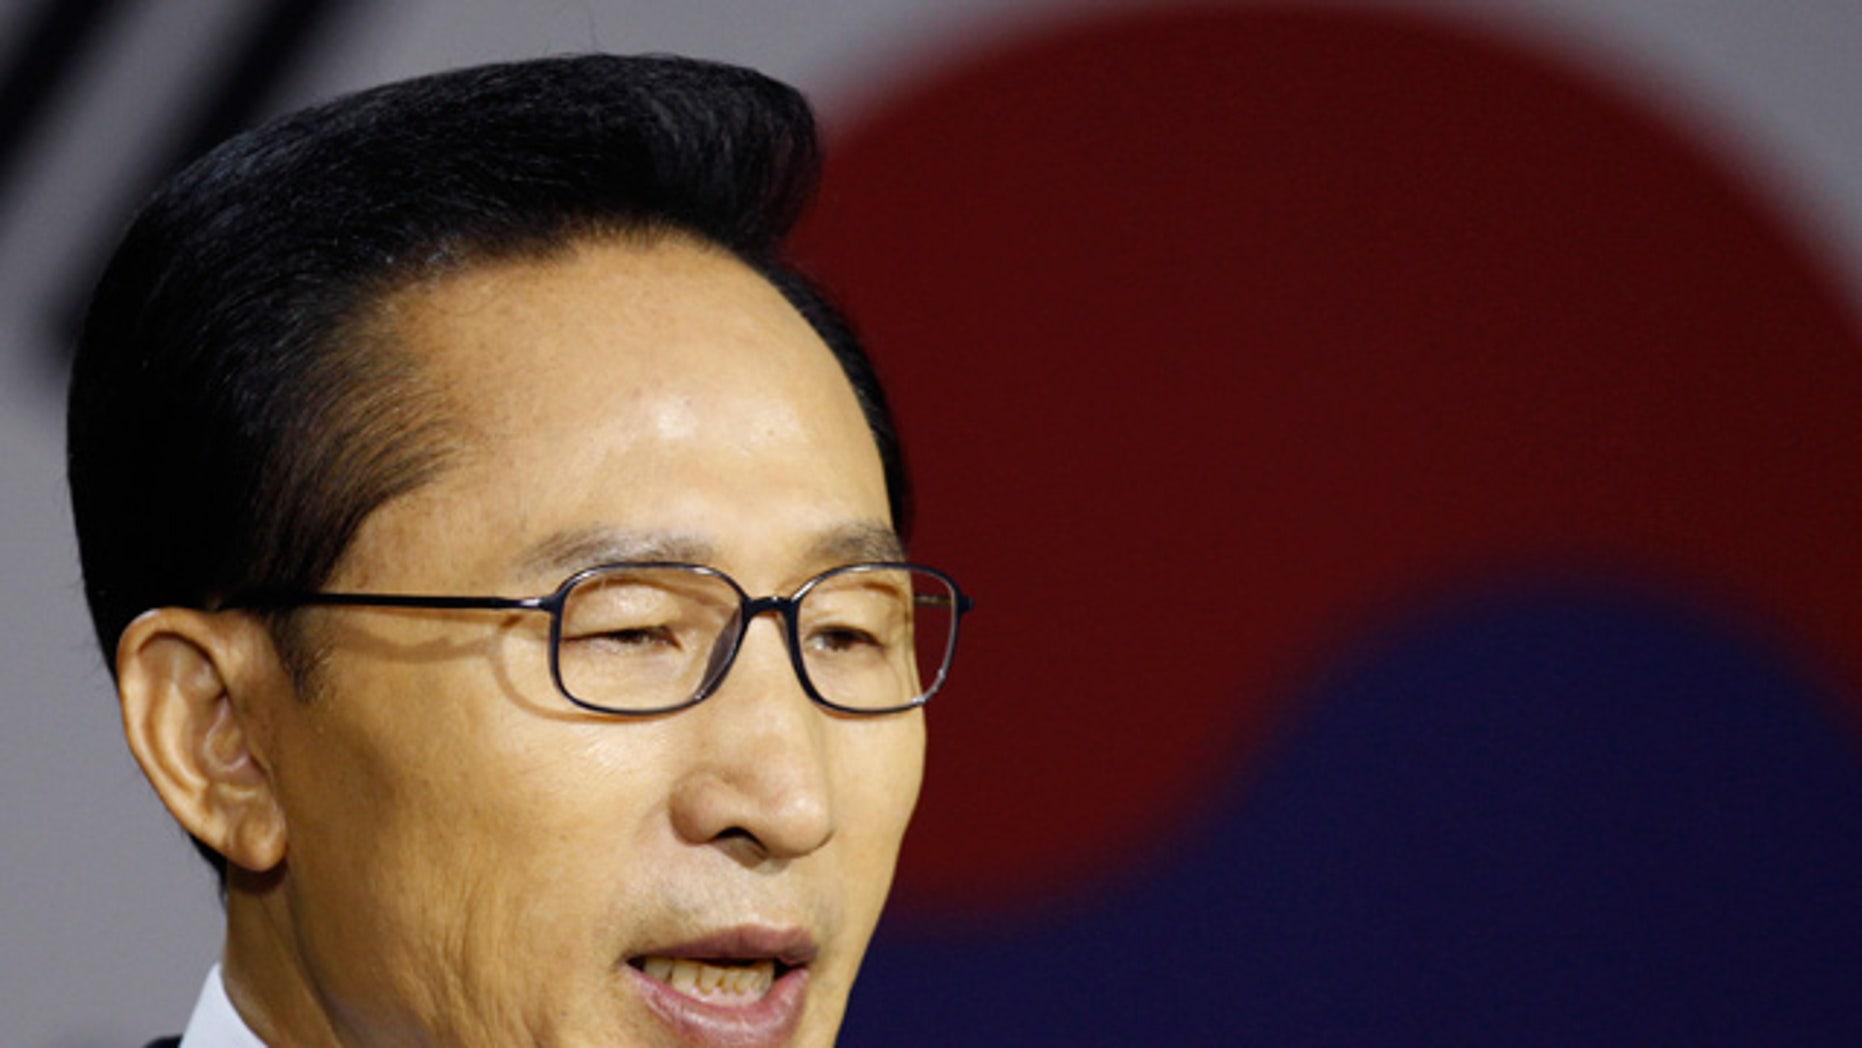 May 24: South Korean President Lee Myung-bak delivers a speech at the War Memorial of Korea in Seoul. (AP)